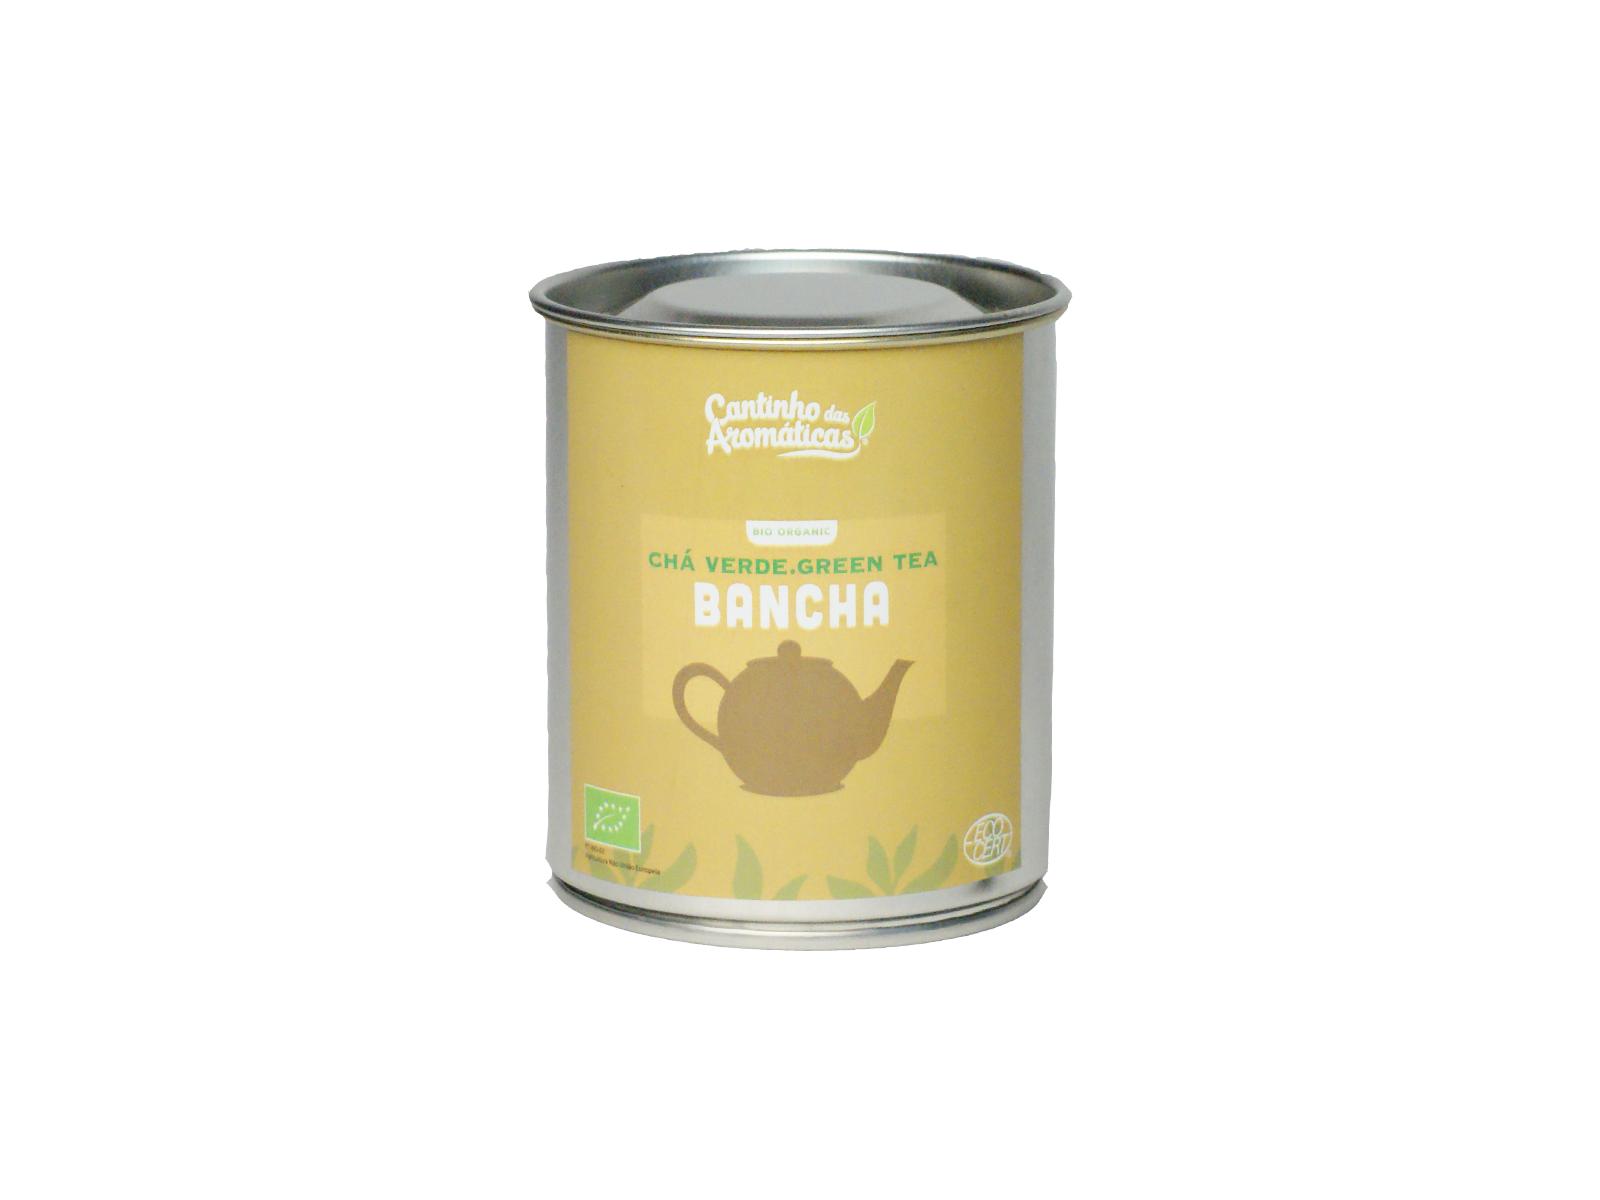 https://www.cantinhodasaromaticas.pt/produto/bancha-bio/